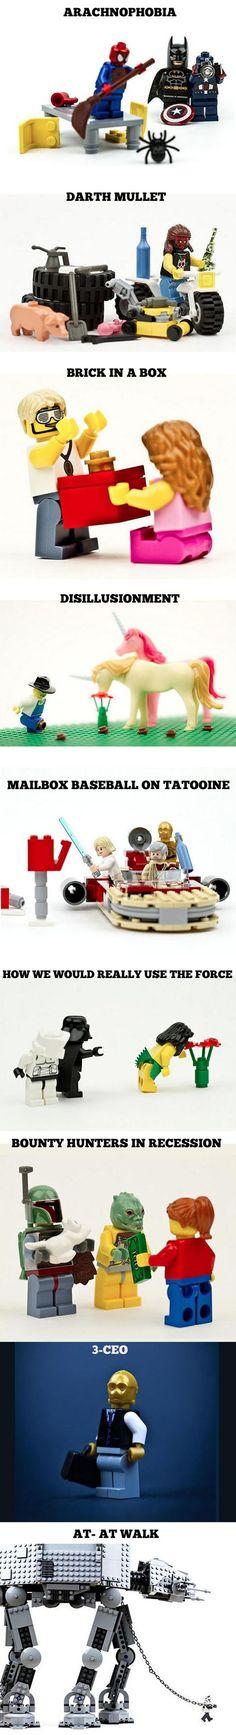 Lego media.